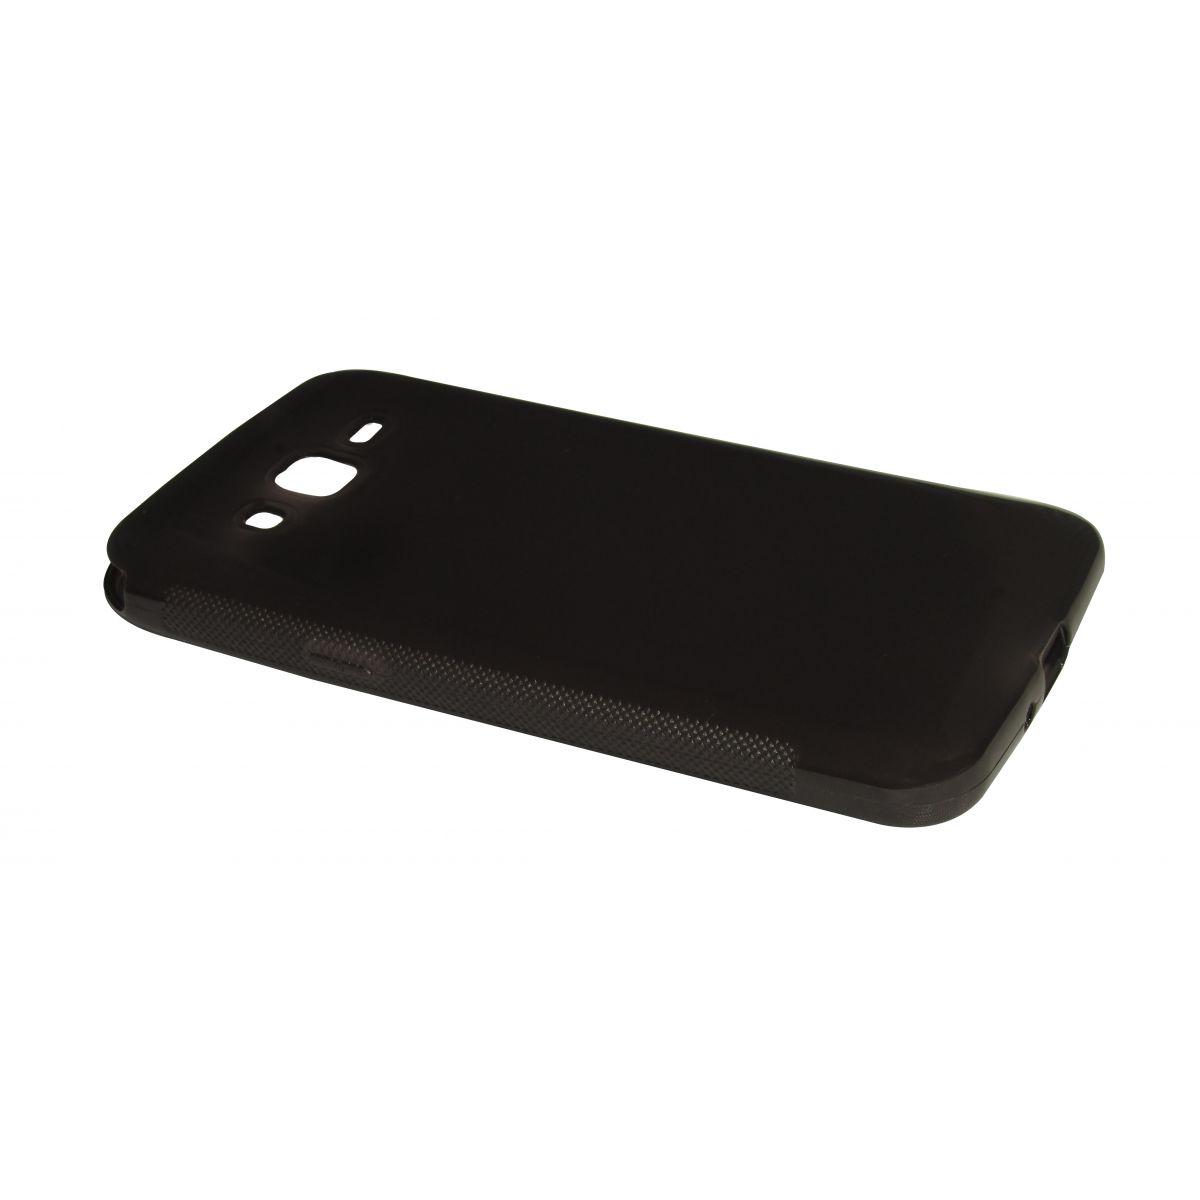 Capa TPU Grafite Samsung Galaxy Gran Duos 2 G7102 + Película Flexível